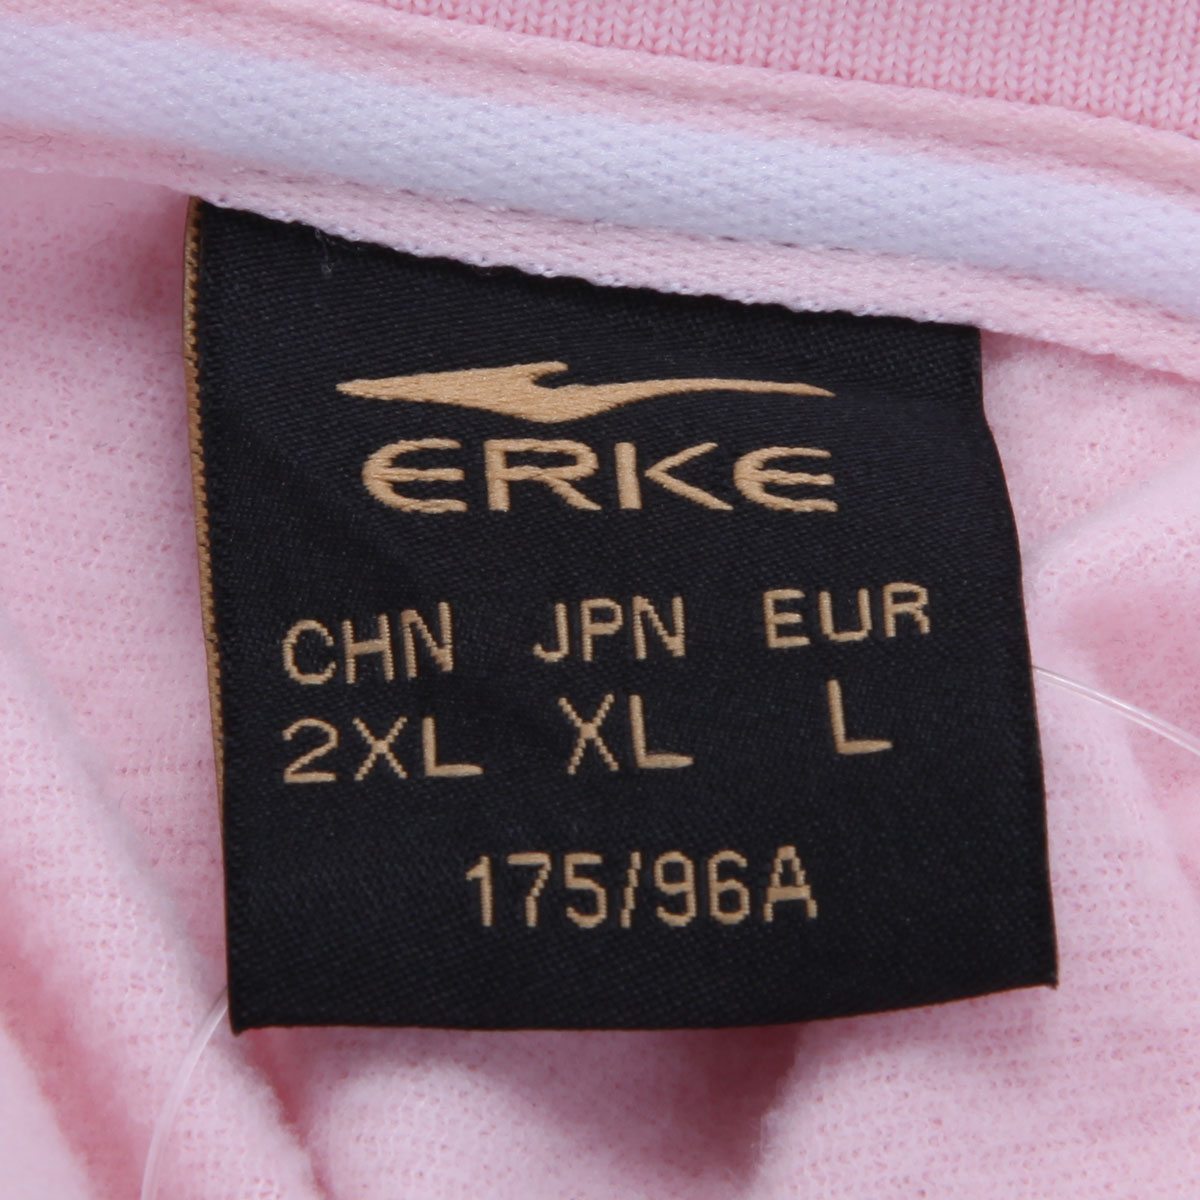 Спортивная толстовка The Erke 14035136/40 Tmall 1403